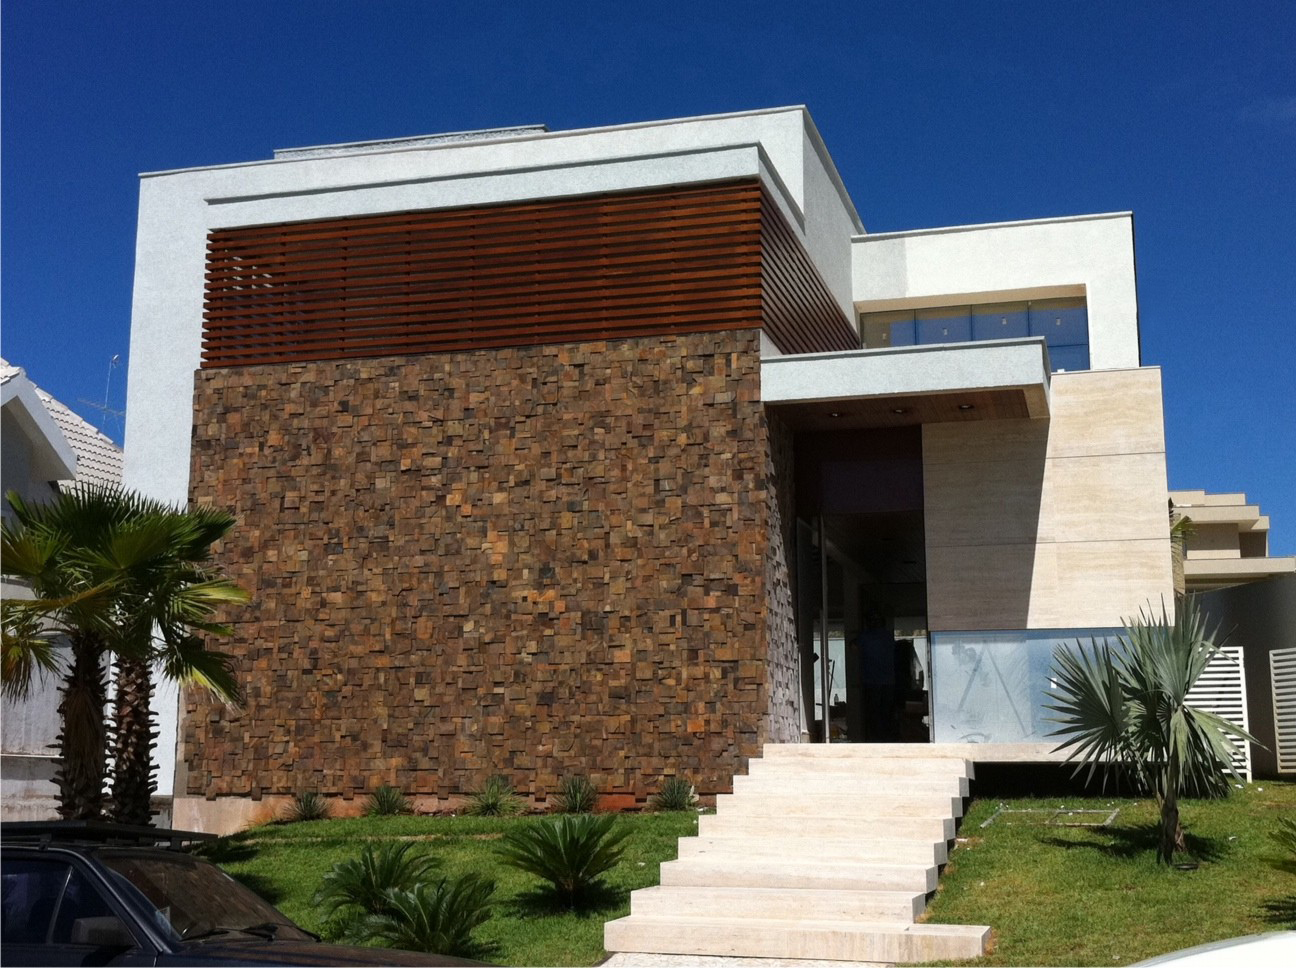 35 modelos de fachadas decoradas com pedras for Fachadas de casas con azulejo